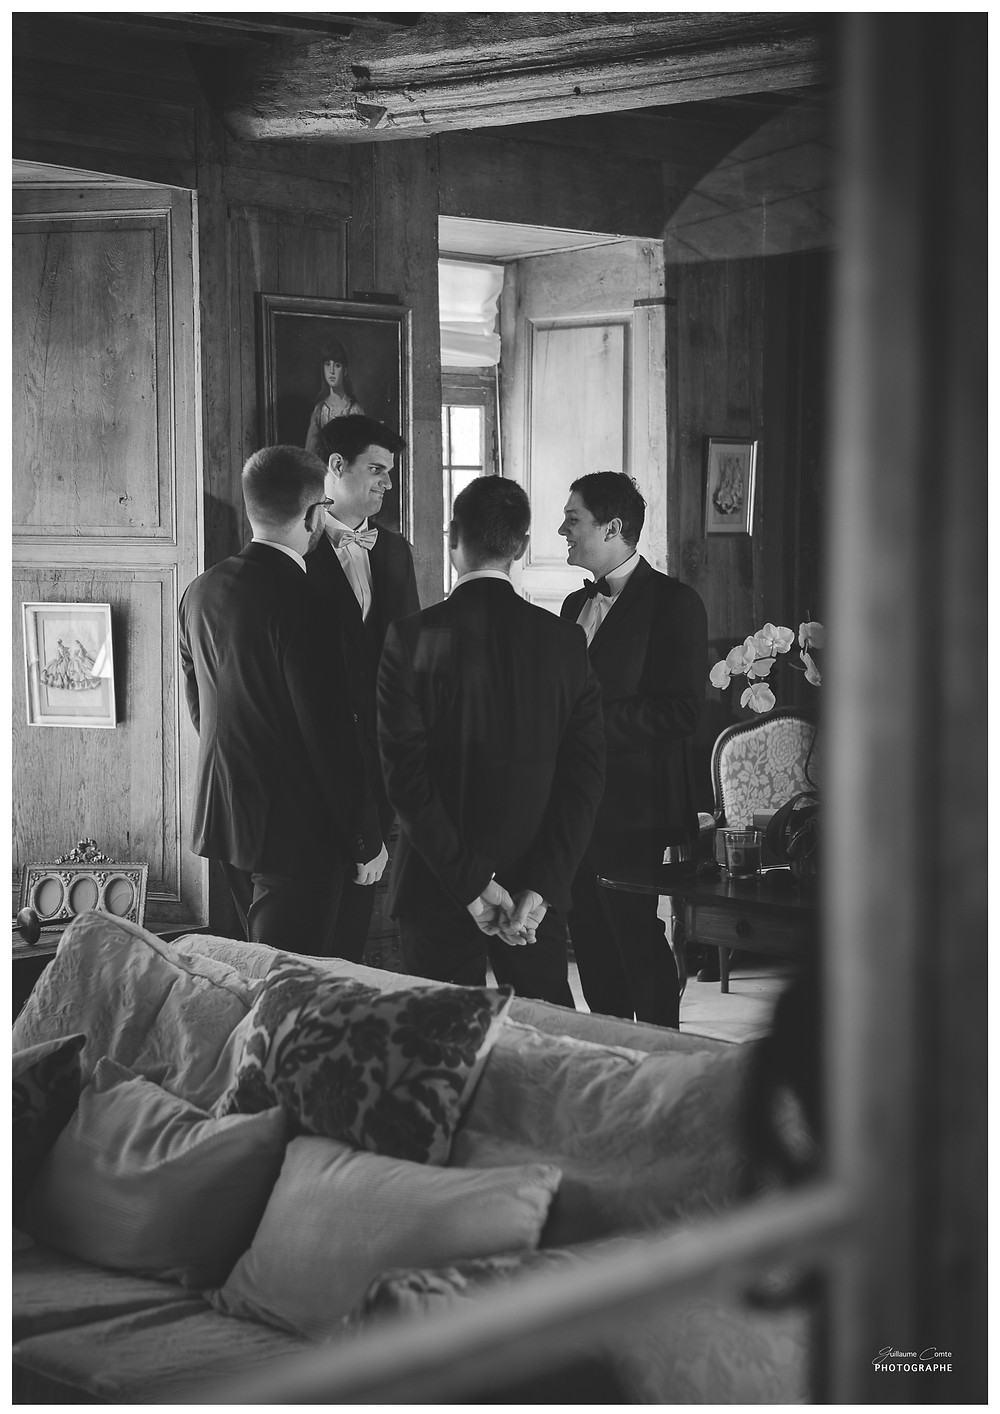 Mariage Limoges Photographe Reportage Grand Echerat Preparatifs